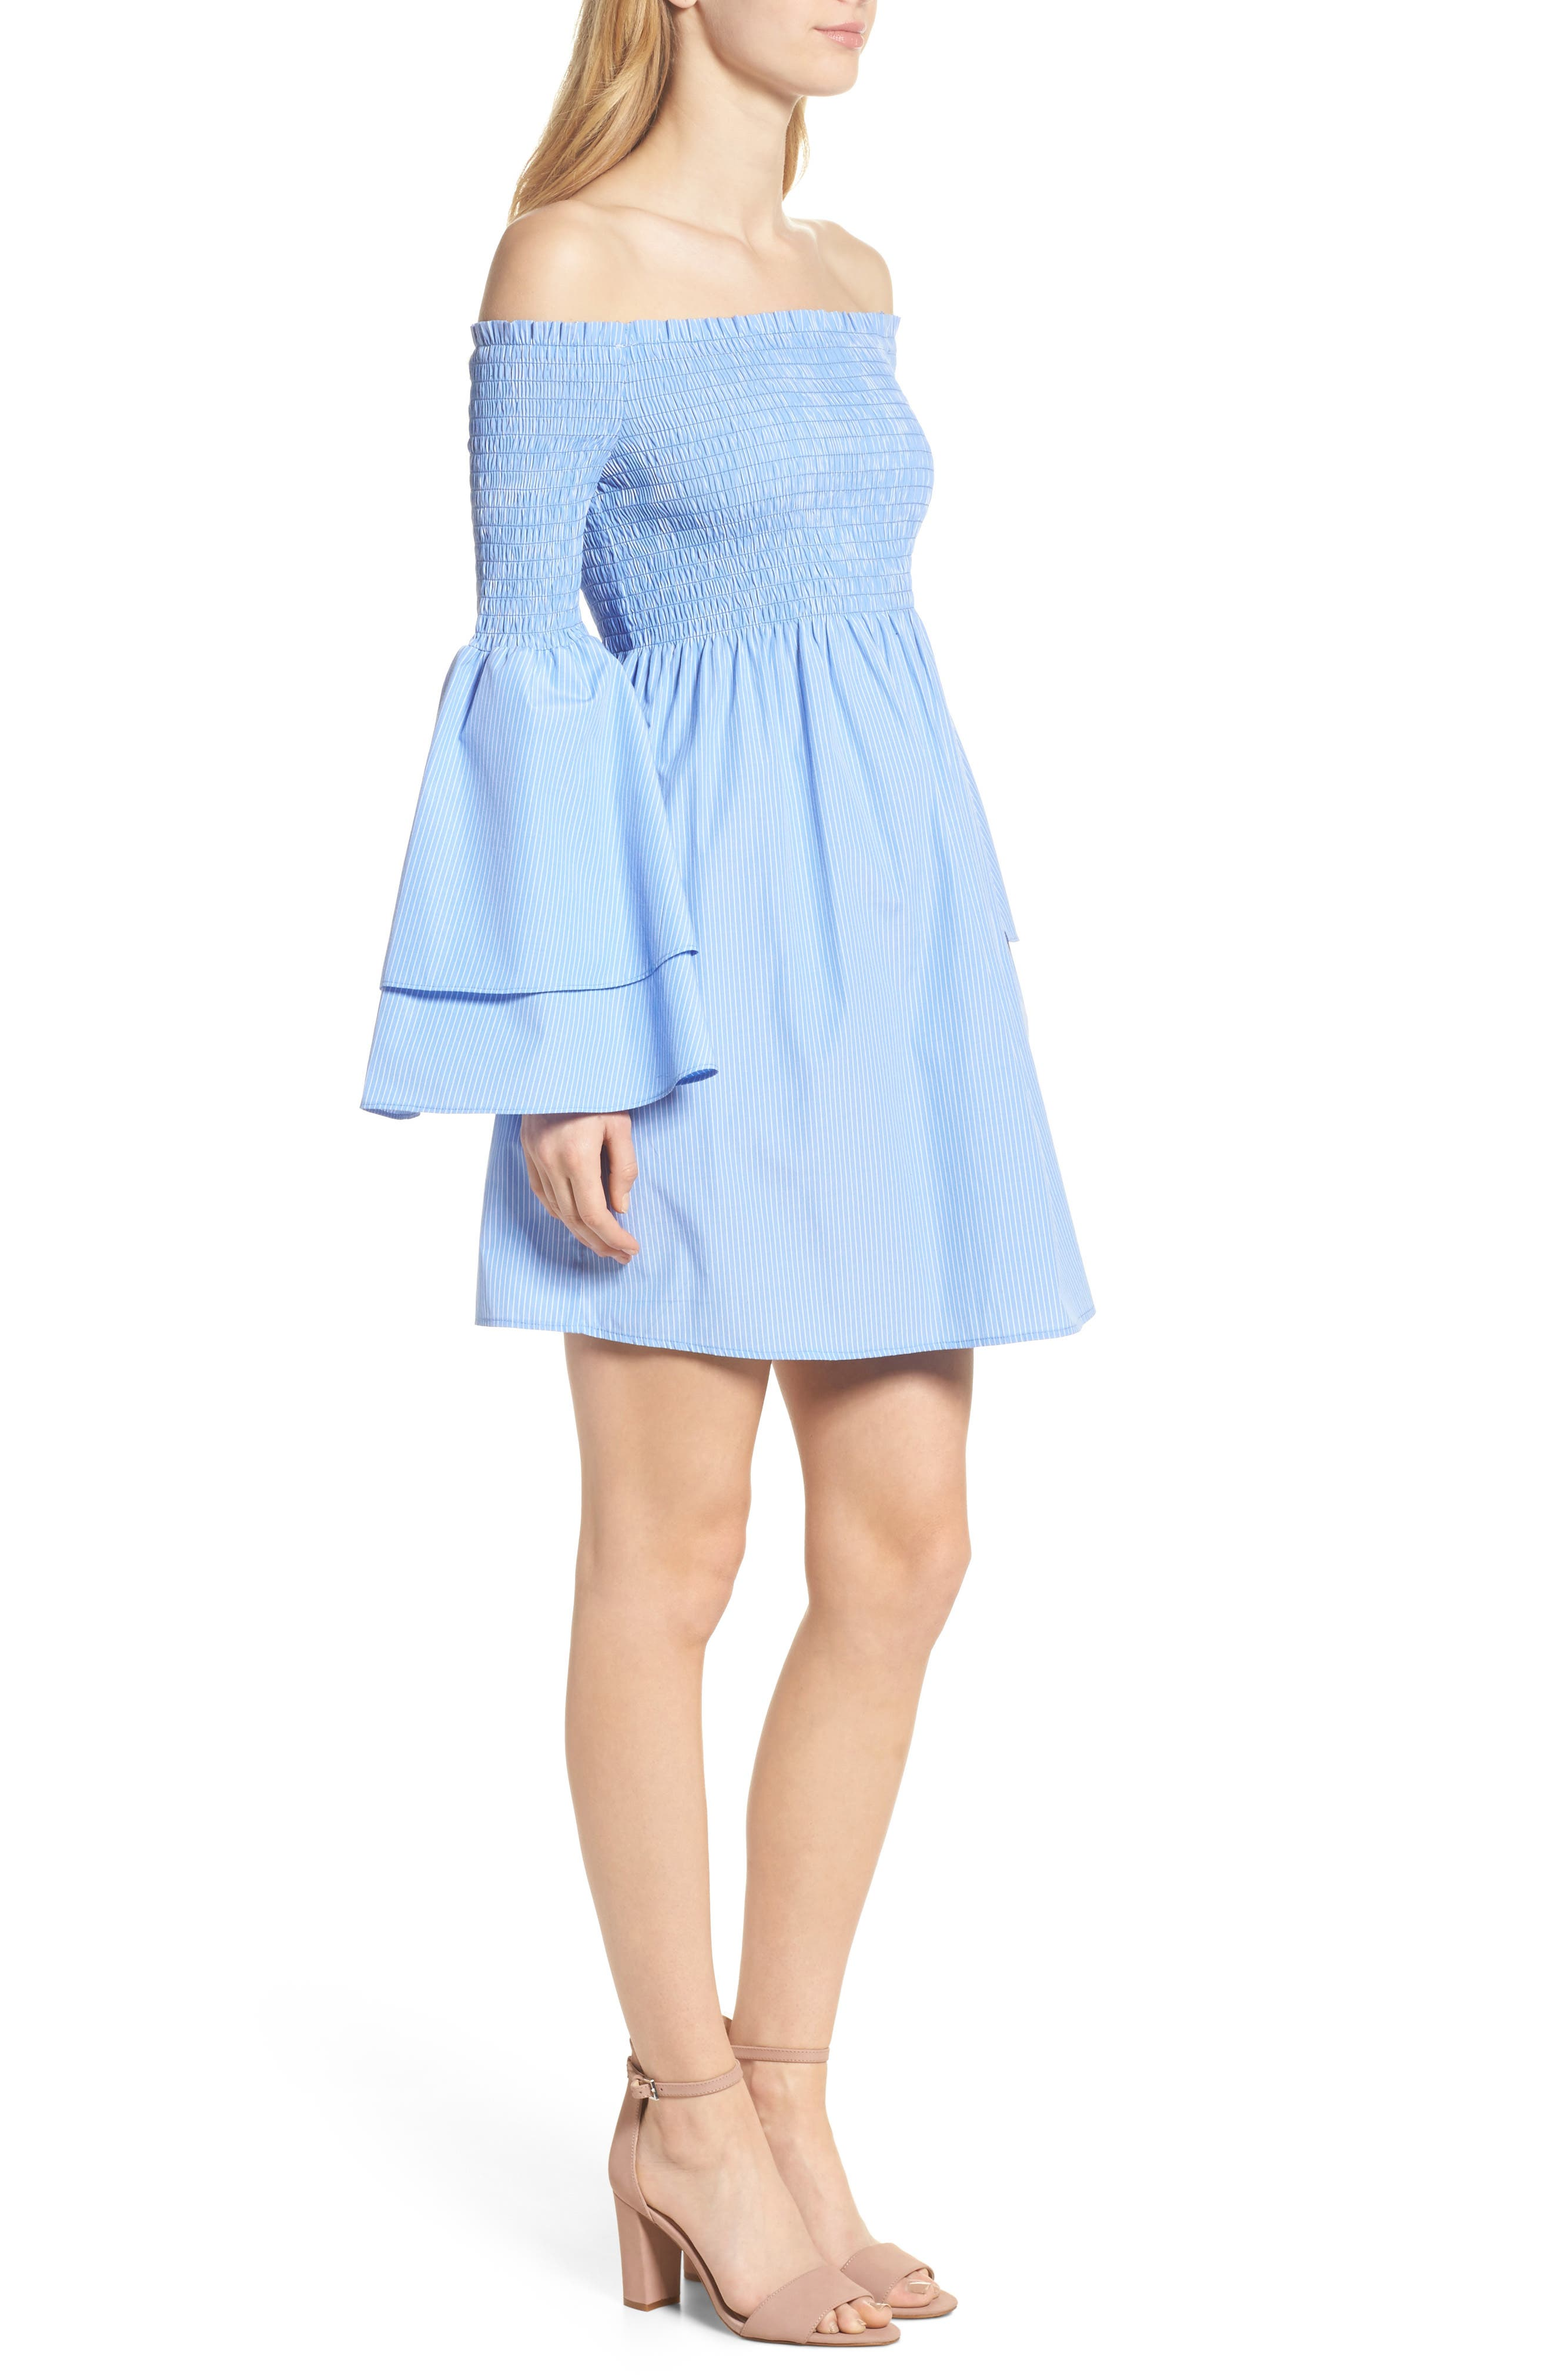 Smocked Off the Shoulder Bell Sleeve Dress,                             Alternate thumbnail 3, color,                             Blue/ White Stripe